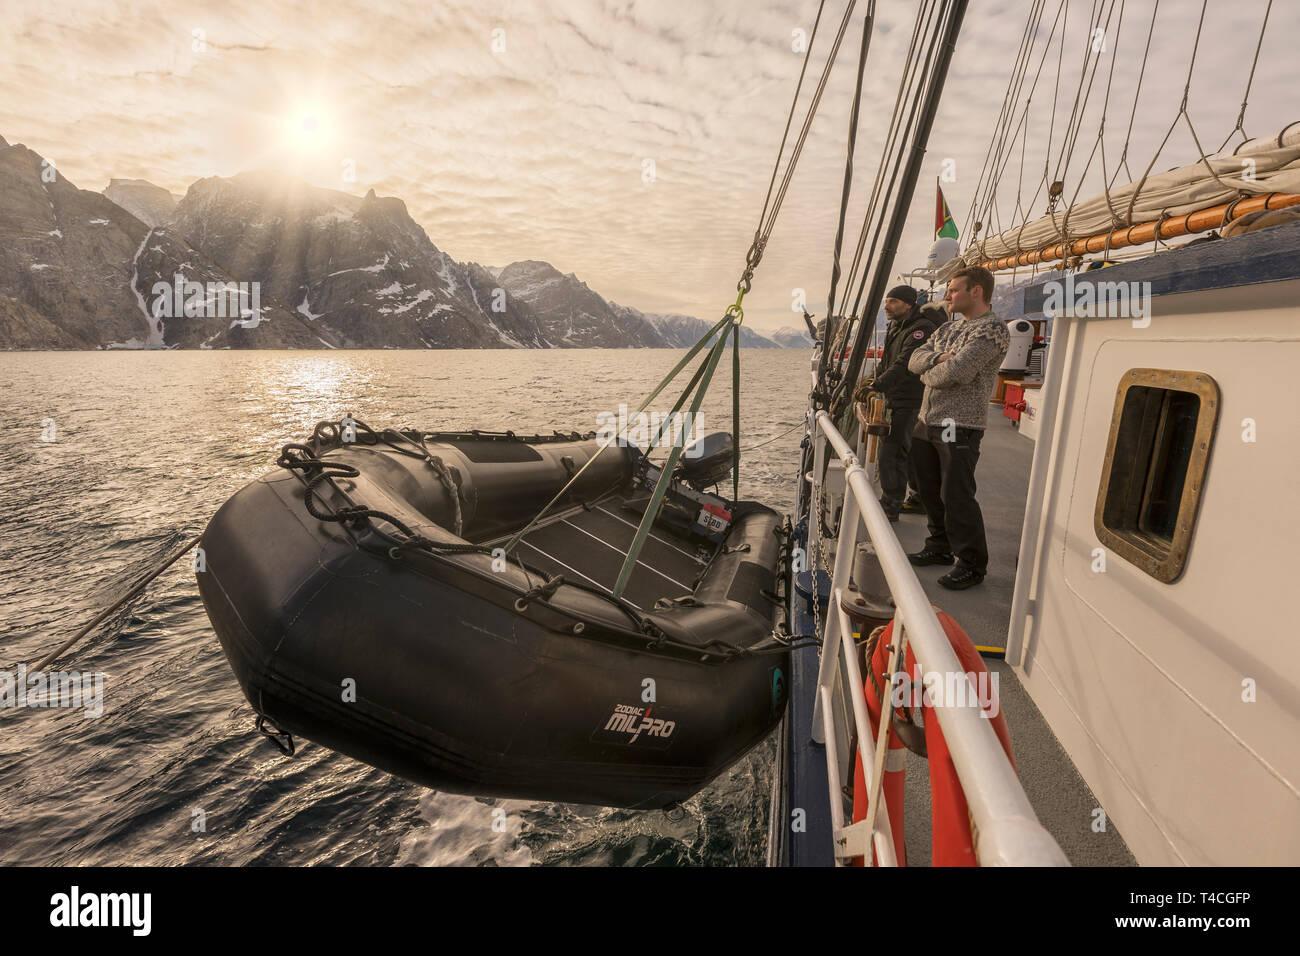 Lifeboat, Rembrant Van Rijn, Schooner Ship, Scoresbysund, Greenland - Stock Image